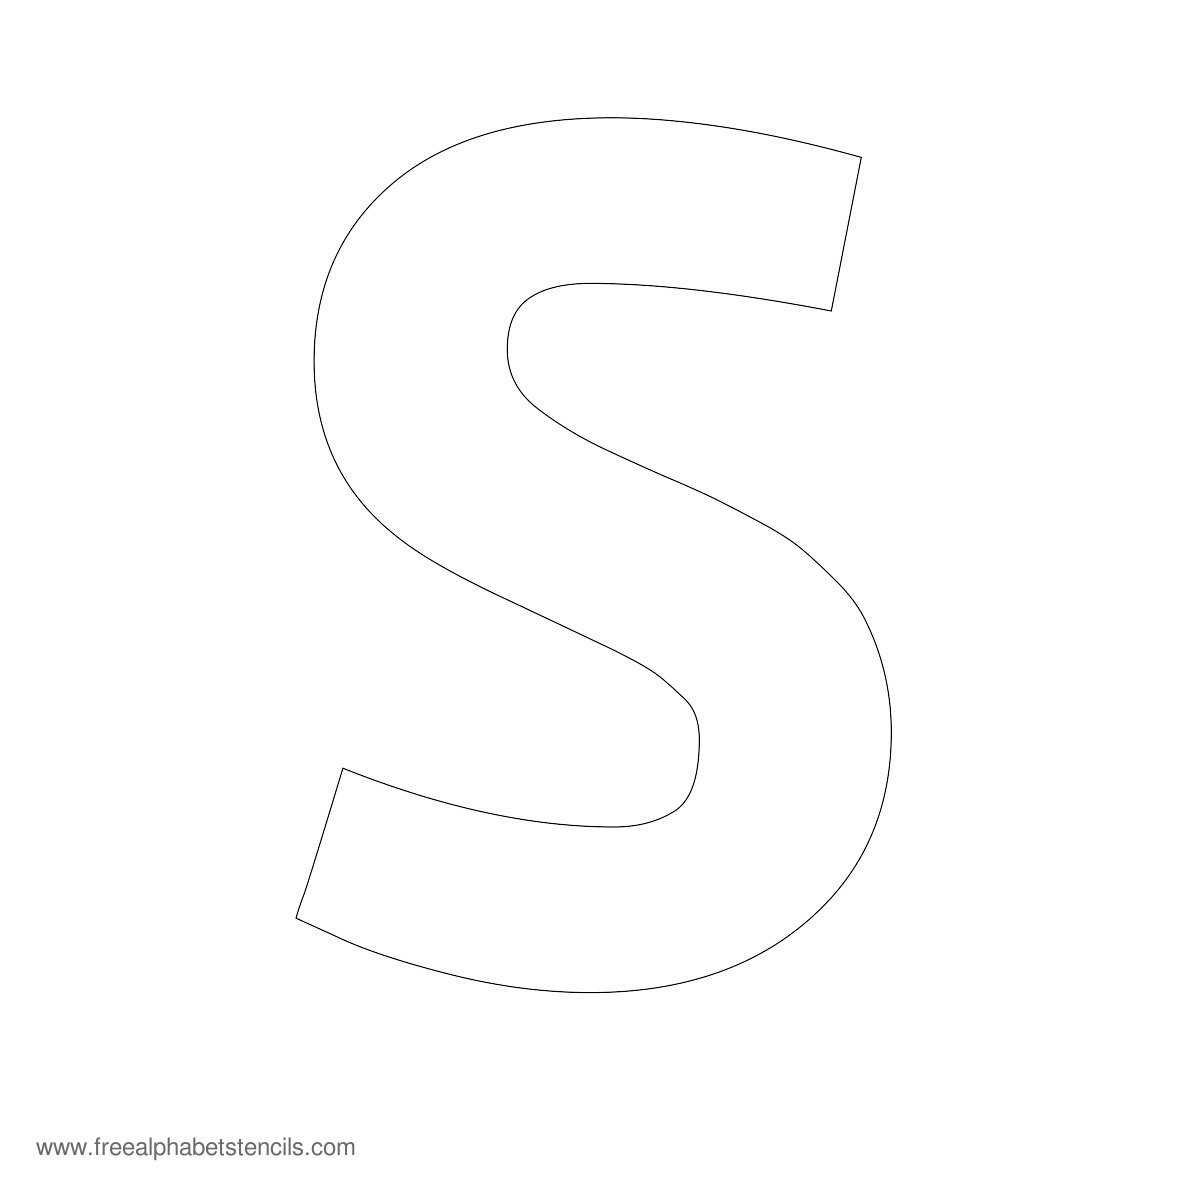 Large Alphabet Stencils | Freealphabetstencils - Free Printable Calligraphy Letter Stencils